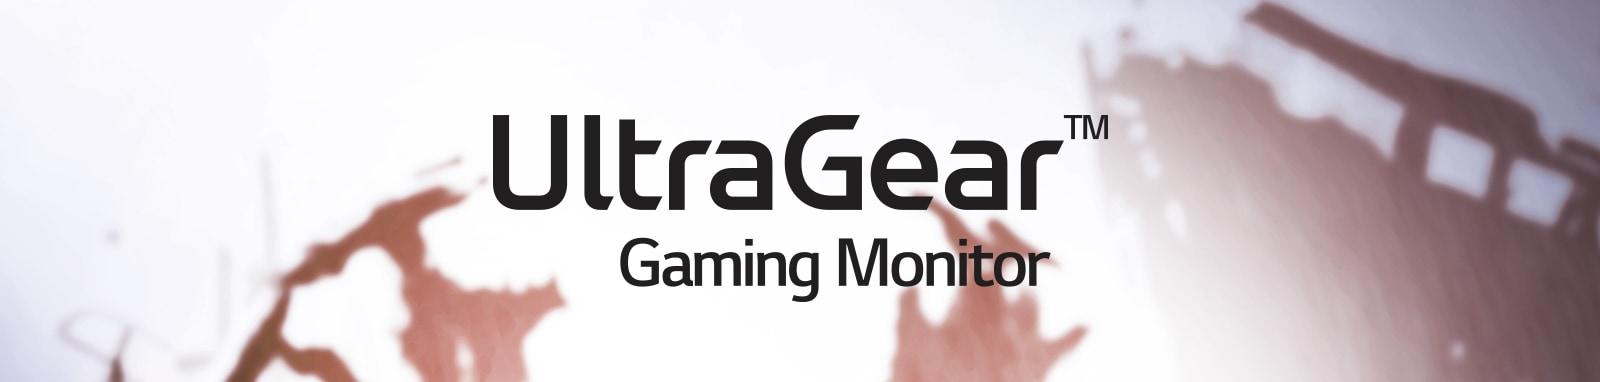 MNT-UltraGear-24GL600F-01-UltraGear-Desktop_2